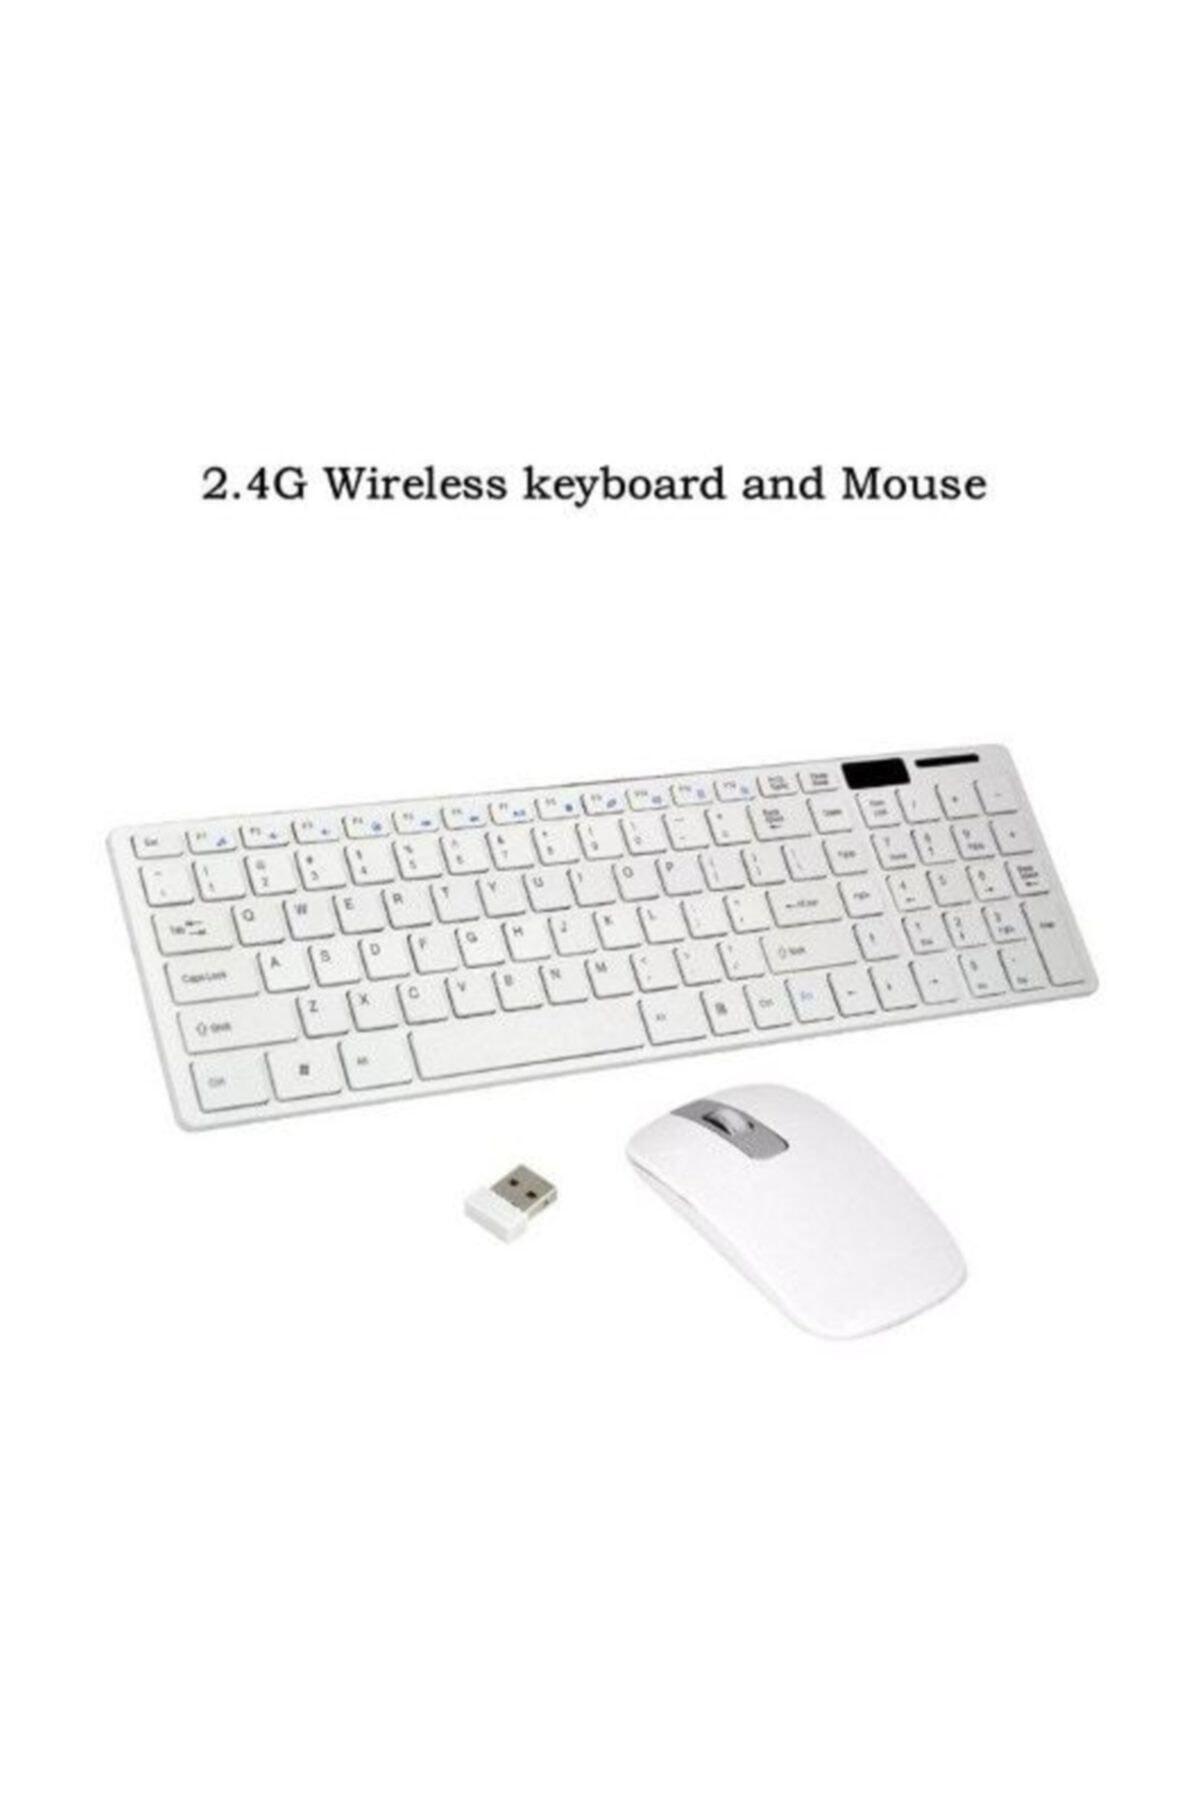 Platoon Kablosuz Klavye Mouse Seti 2.4 Ghz Wireless Tv Pc Uyumlu Pl-374 2